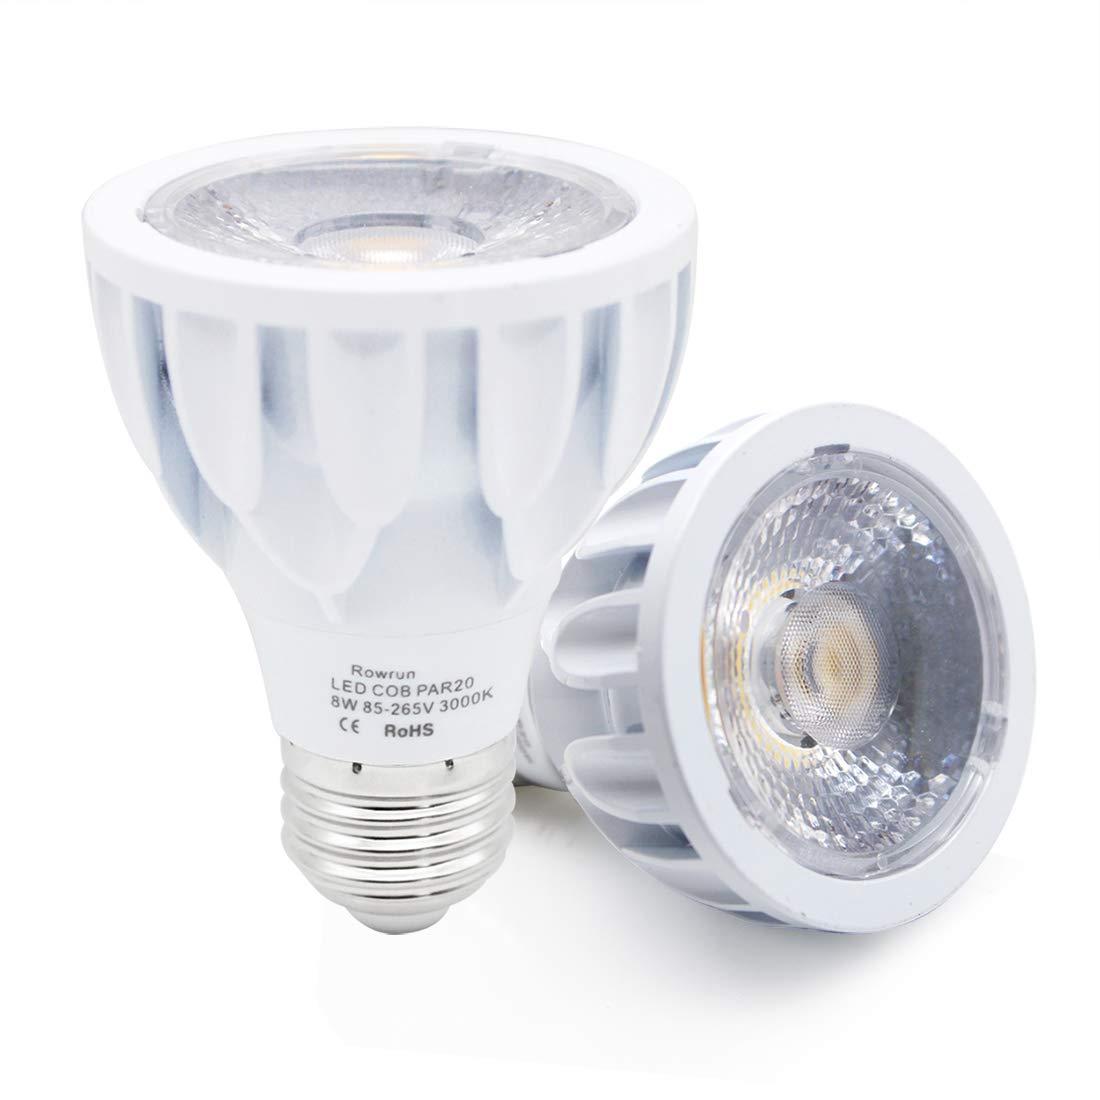 75 Watts Equivalent PAR20 LED Bulb 6000K Daylight White Non-Dimmable 8W E26 Medium Base COB Spot Light 24/° Beam Angle High CRI 85+ 800LM AC 85-265V Flood Lamp 2-Pack by Rowrun